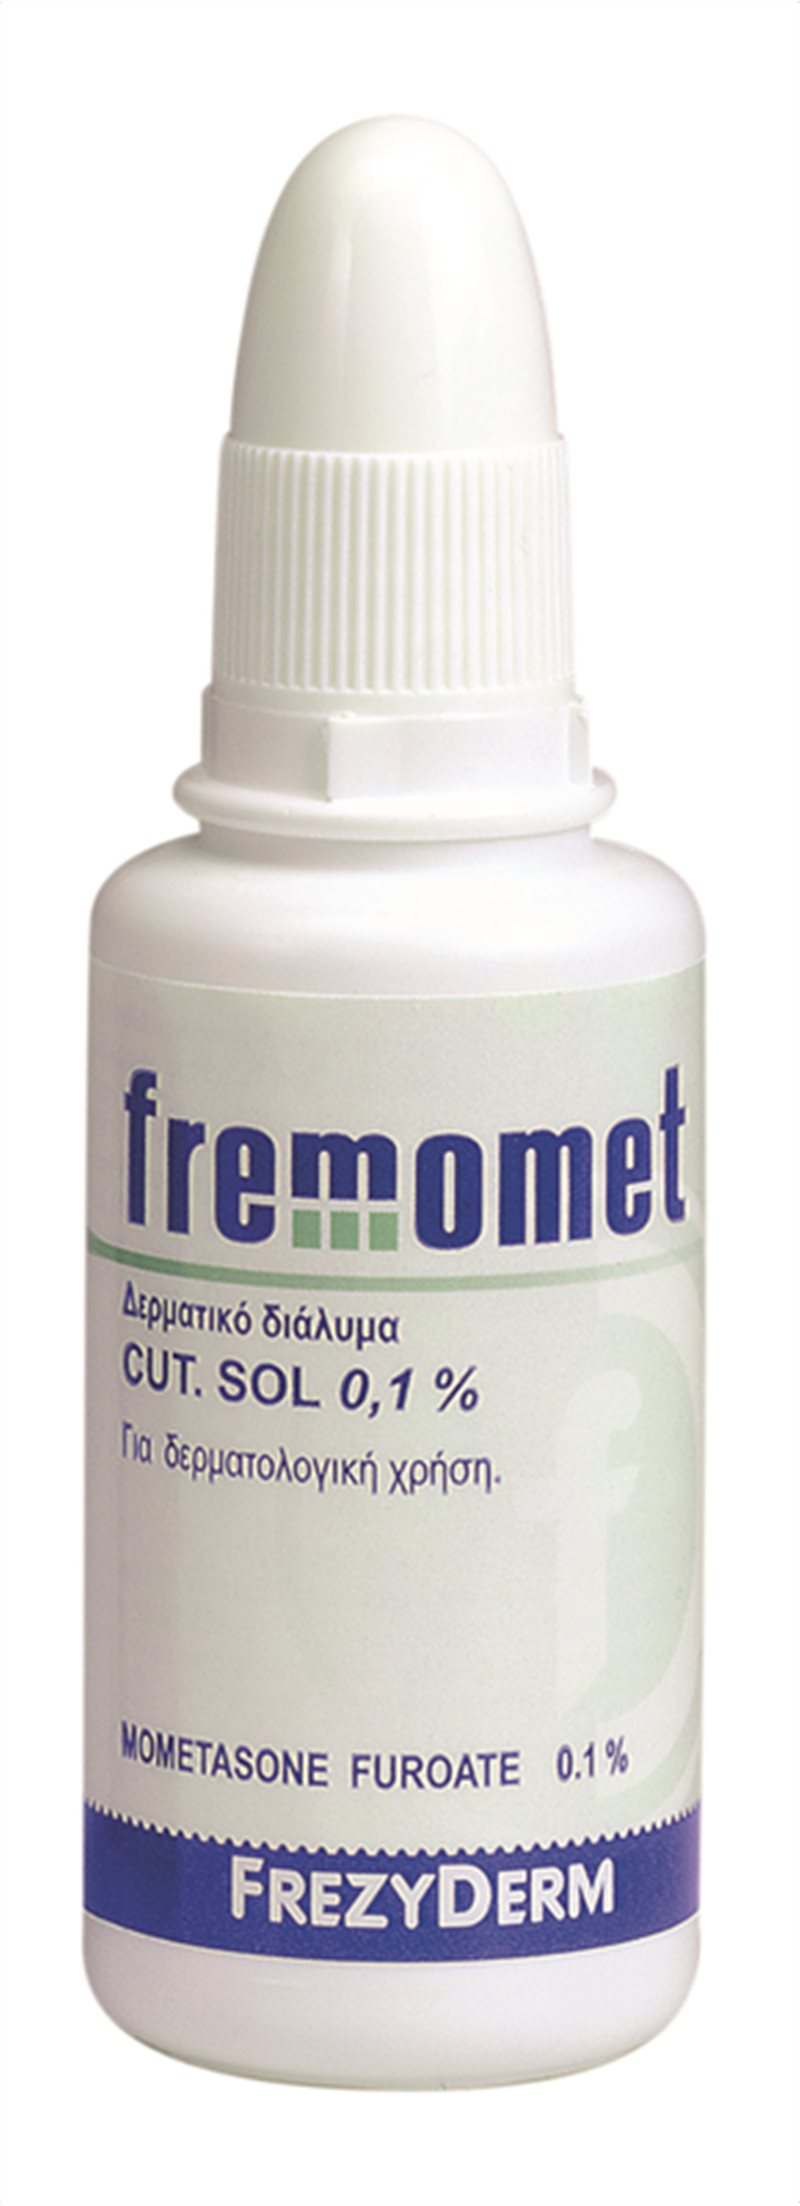 FREMOMET SOLUTION